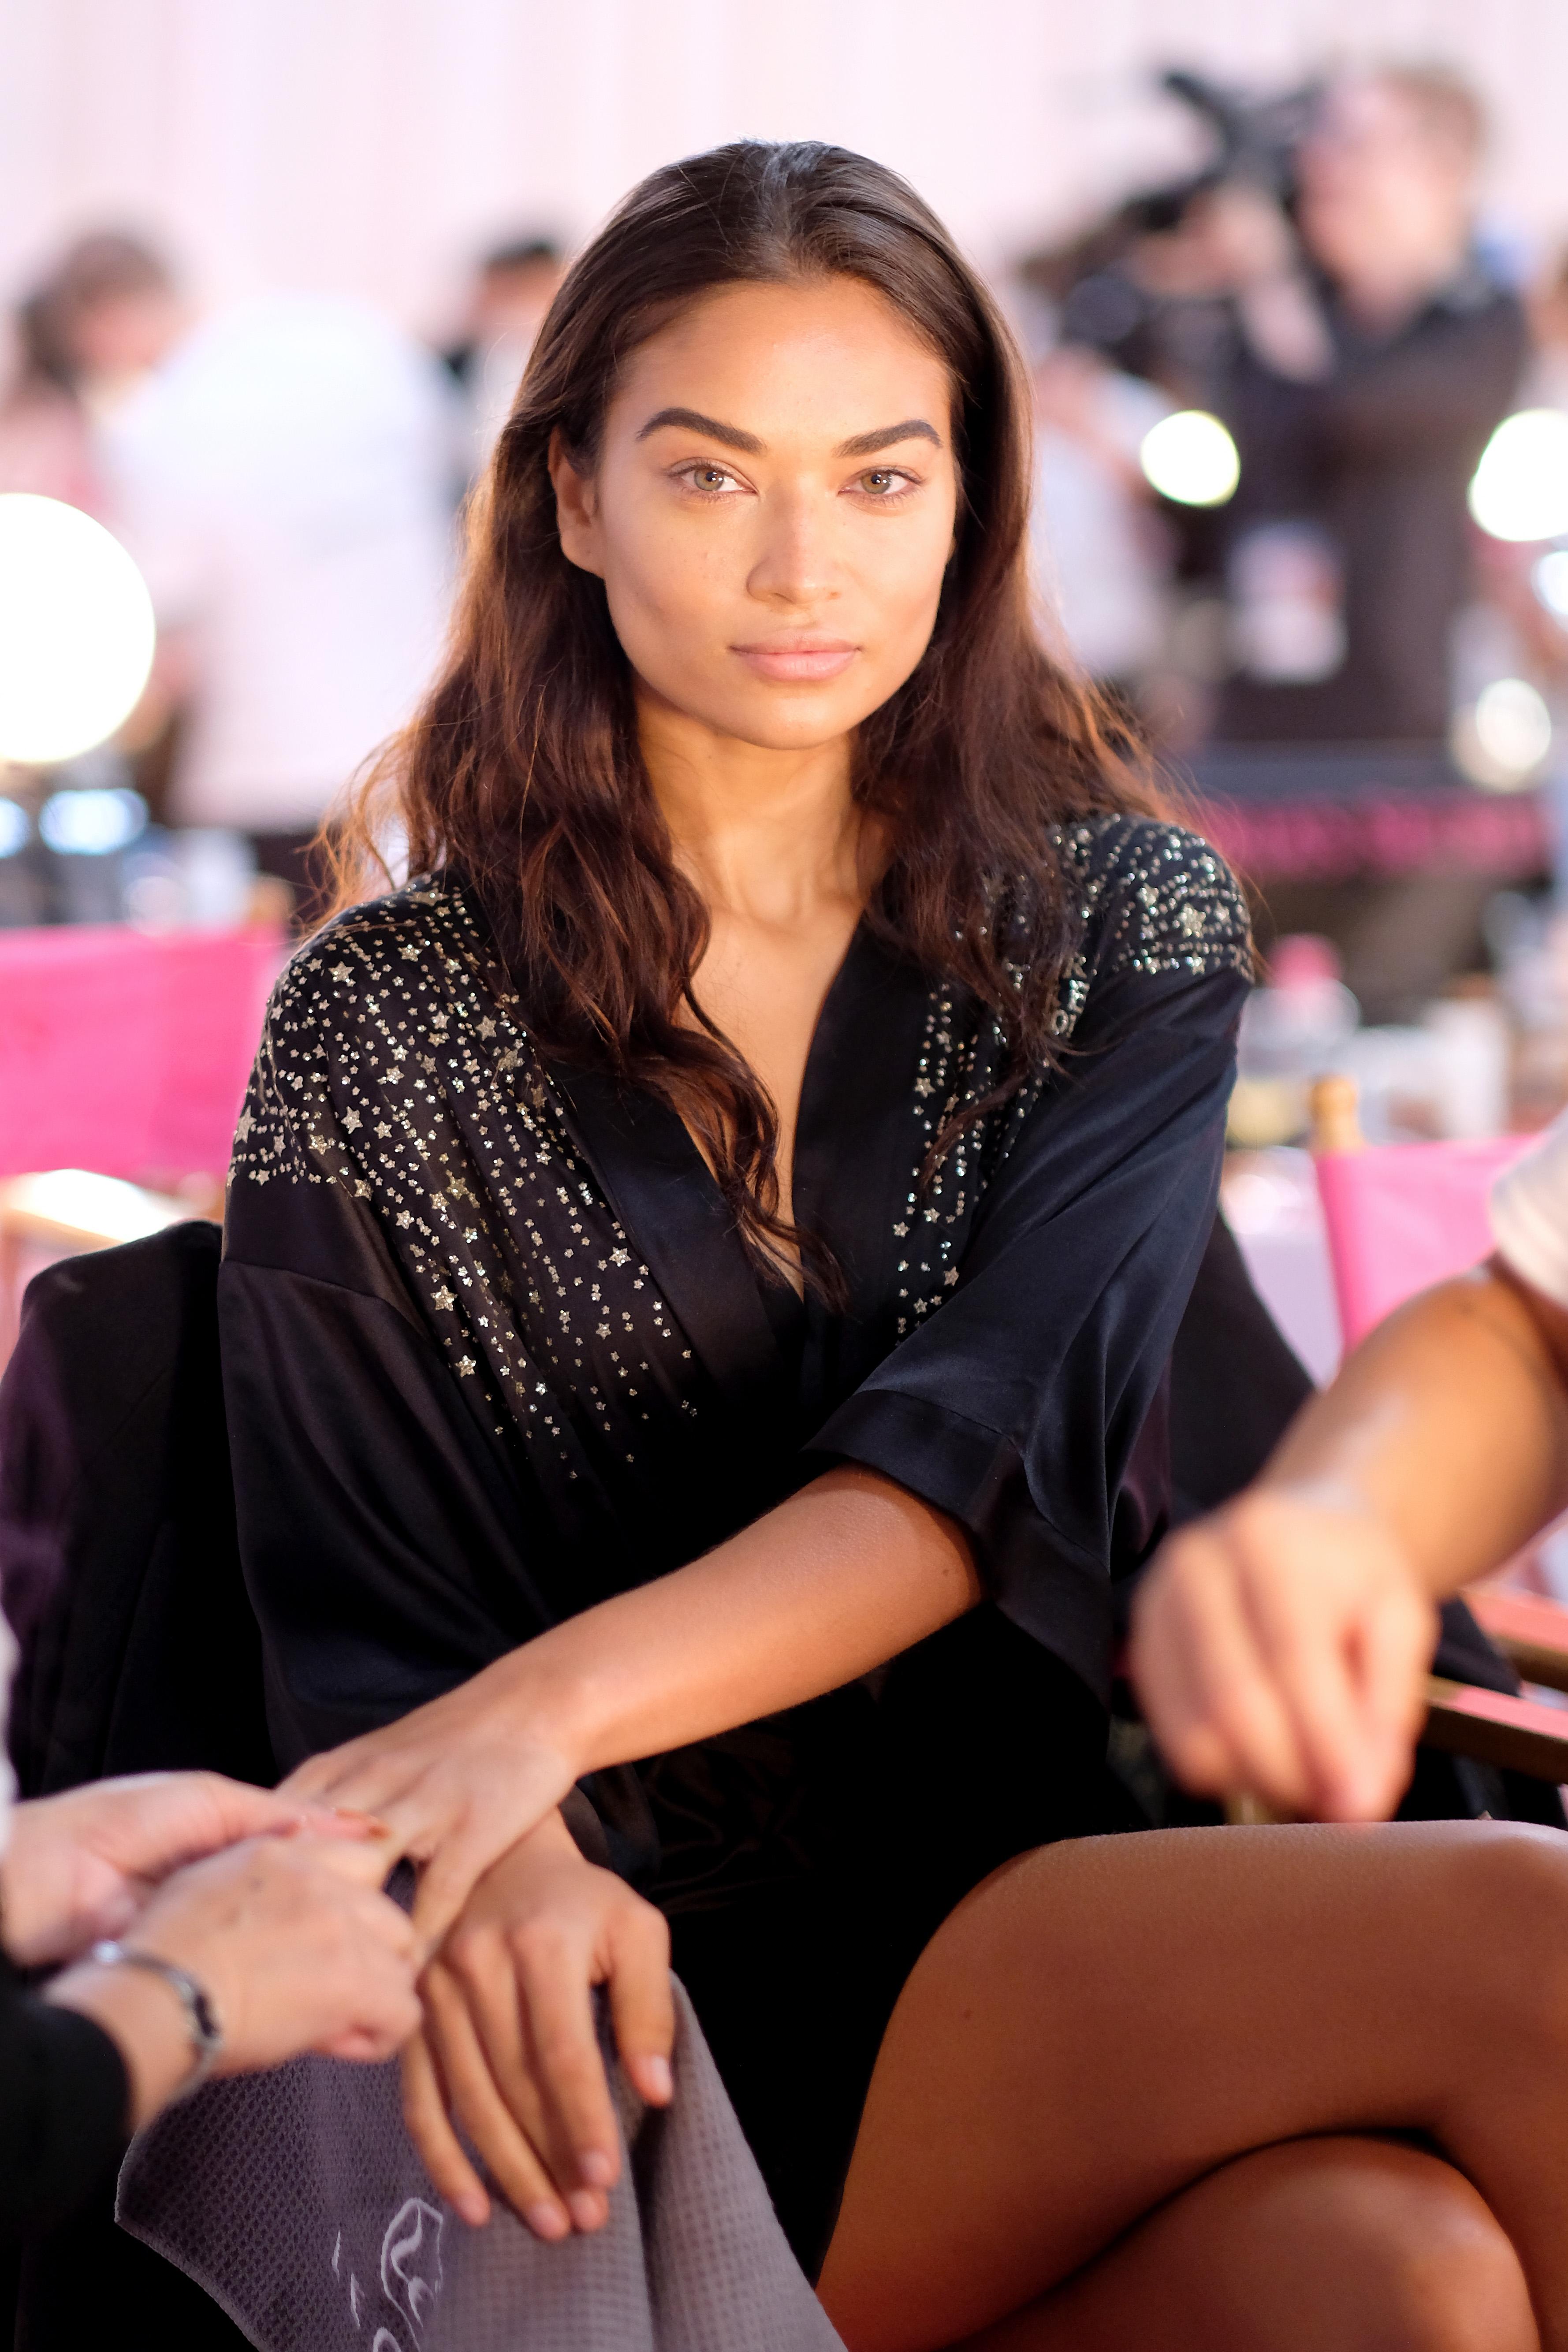 Dimitrios Kambouris/Getty Images for Victoria's Secret/AFP